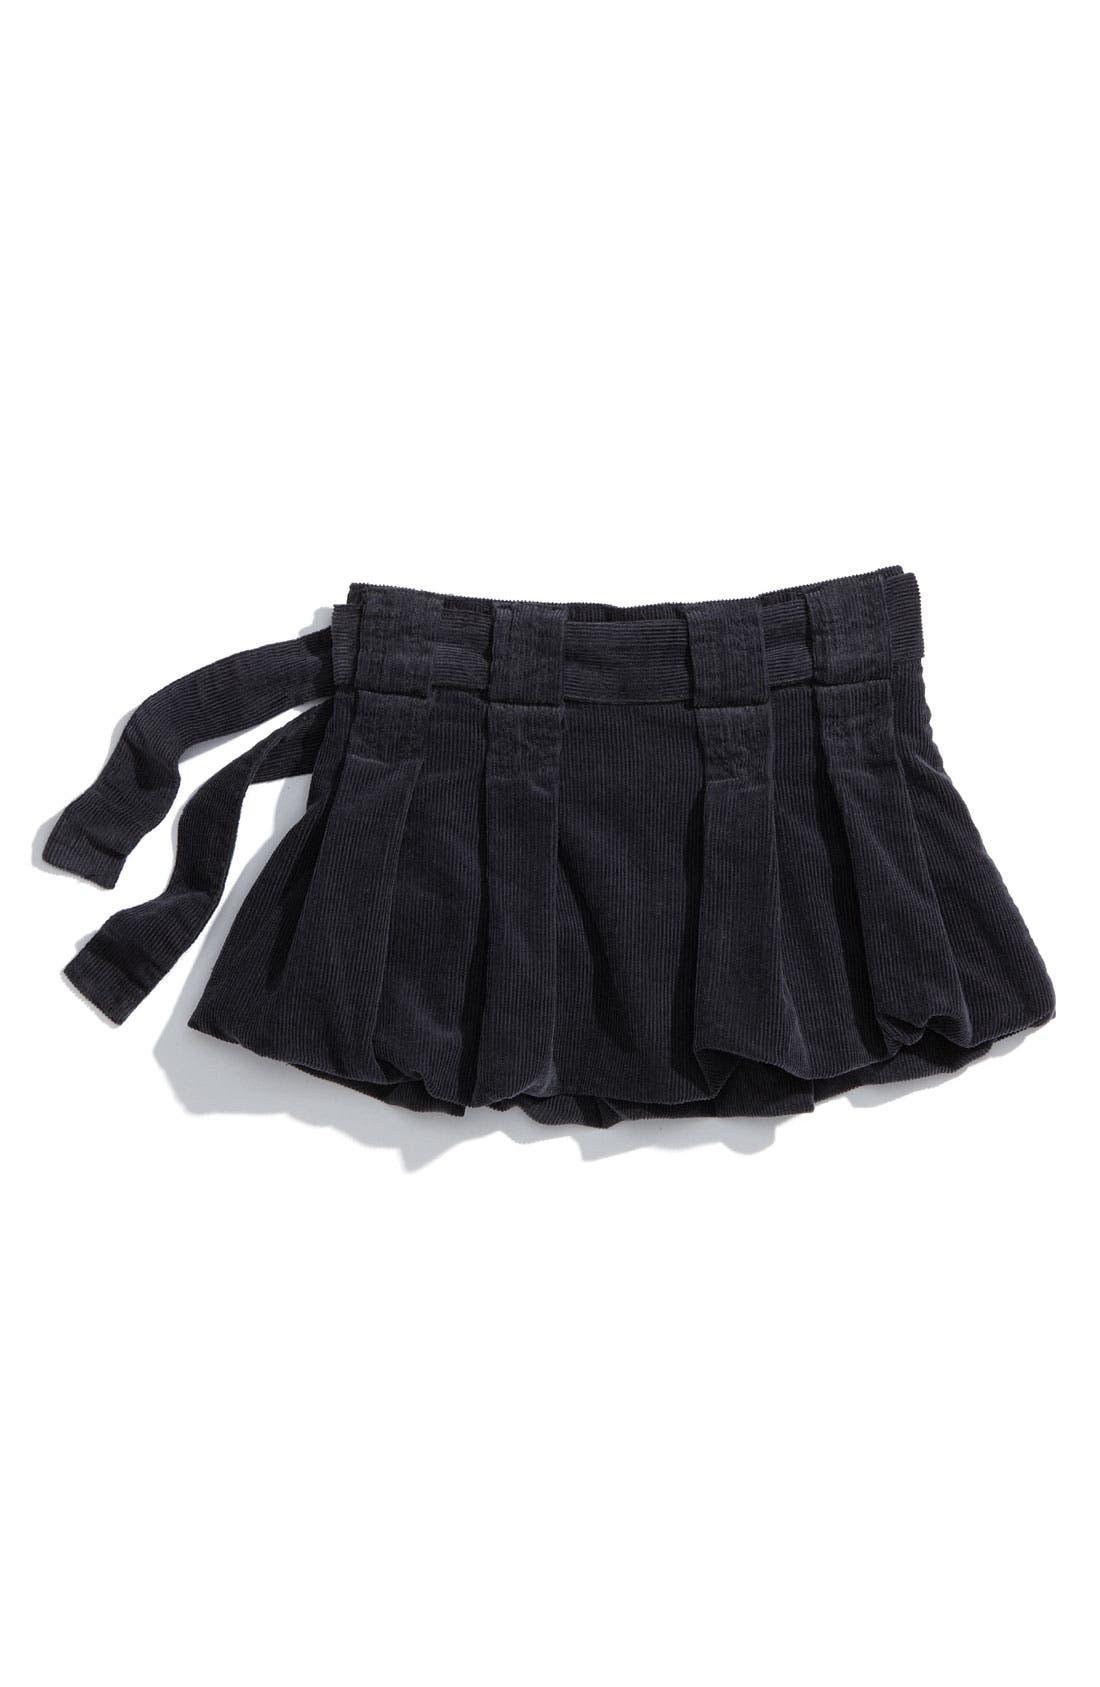 Main Image - United Colors of Benetton Kids Corduroy Skirt (Toddler)